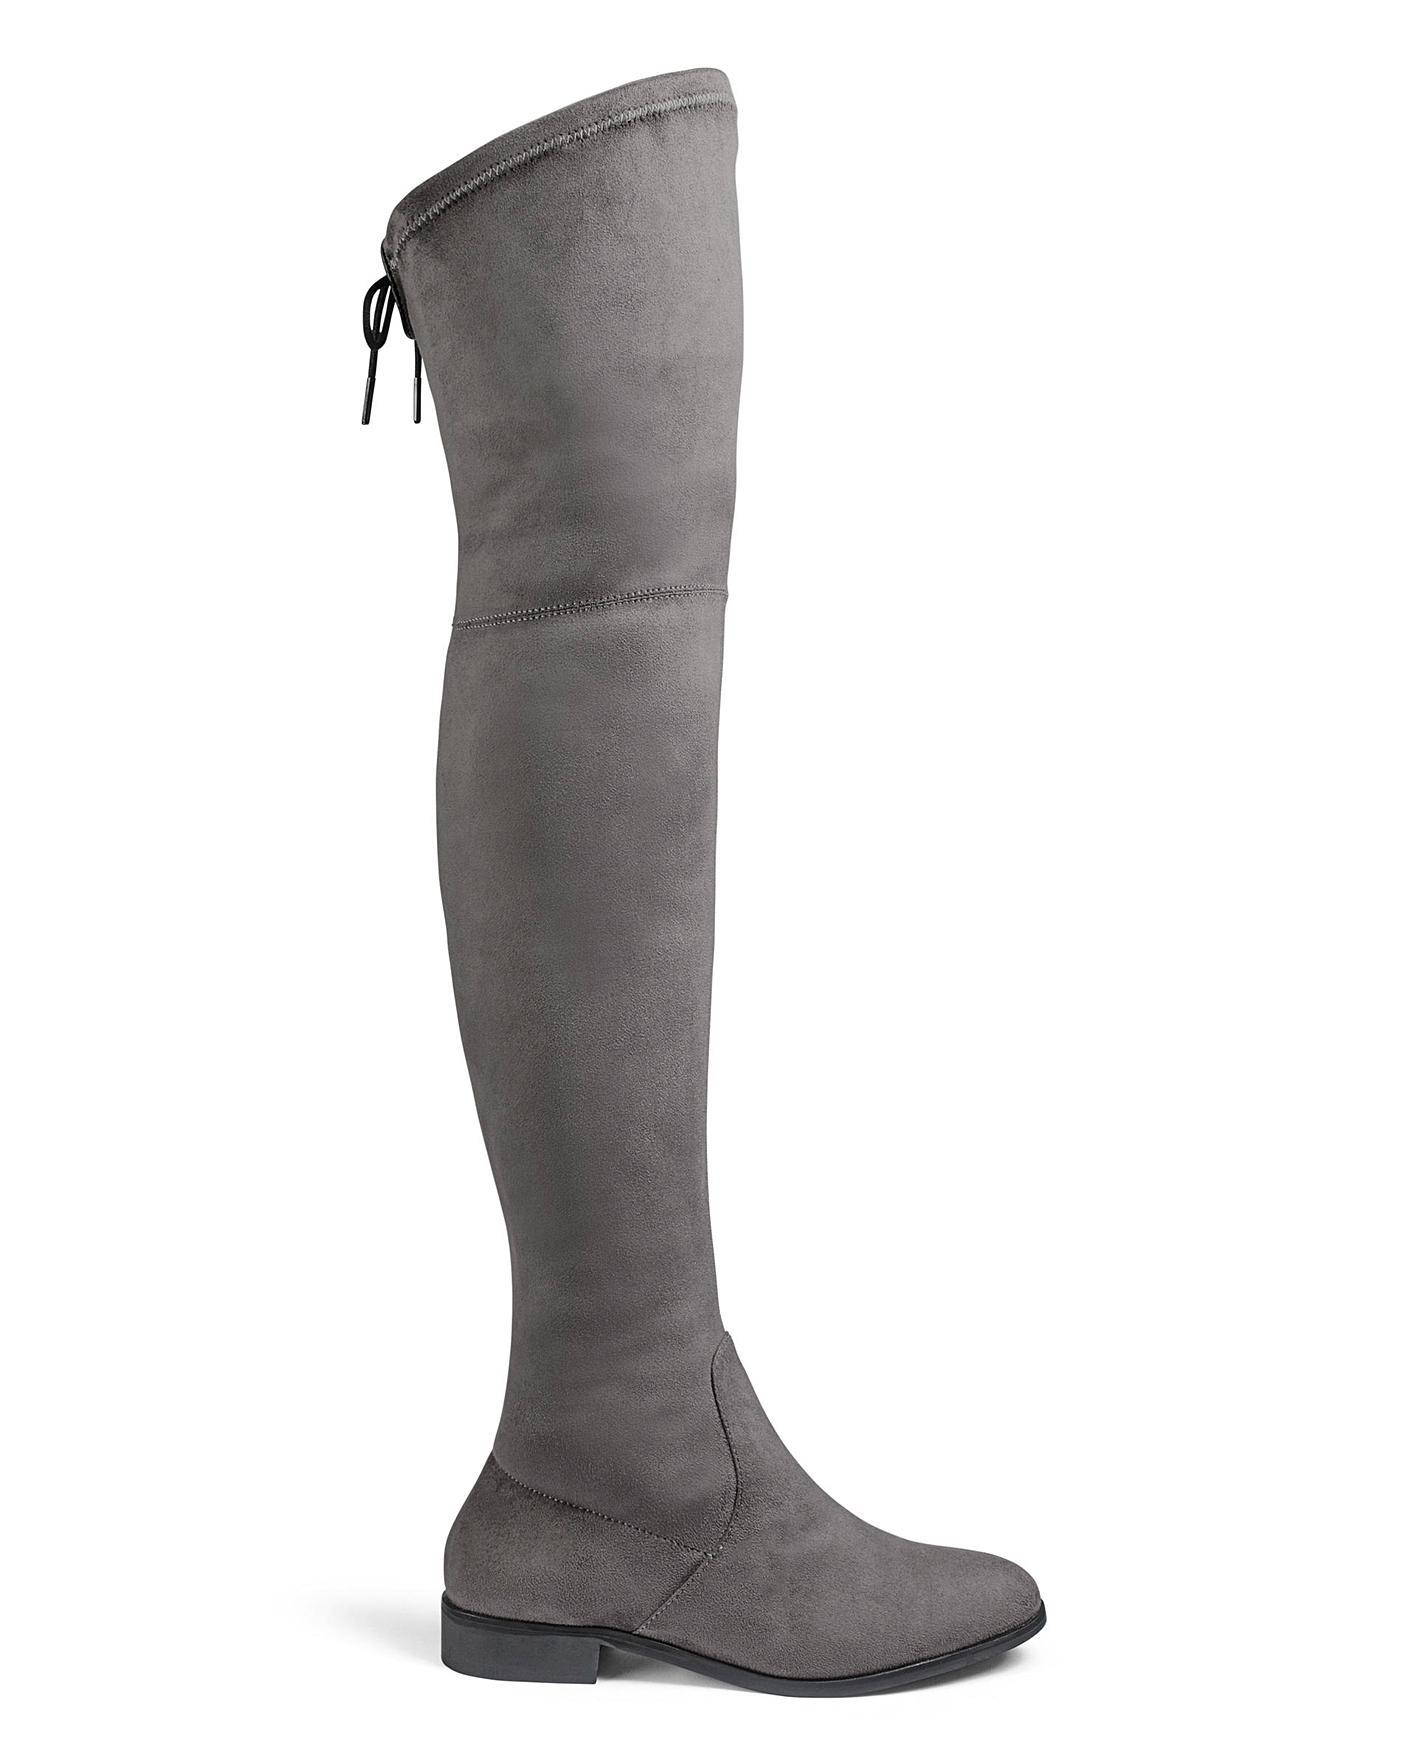 Nicole Boots Ex Wide Fit Standard Calf